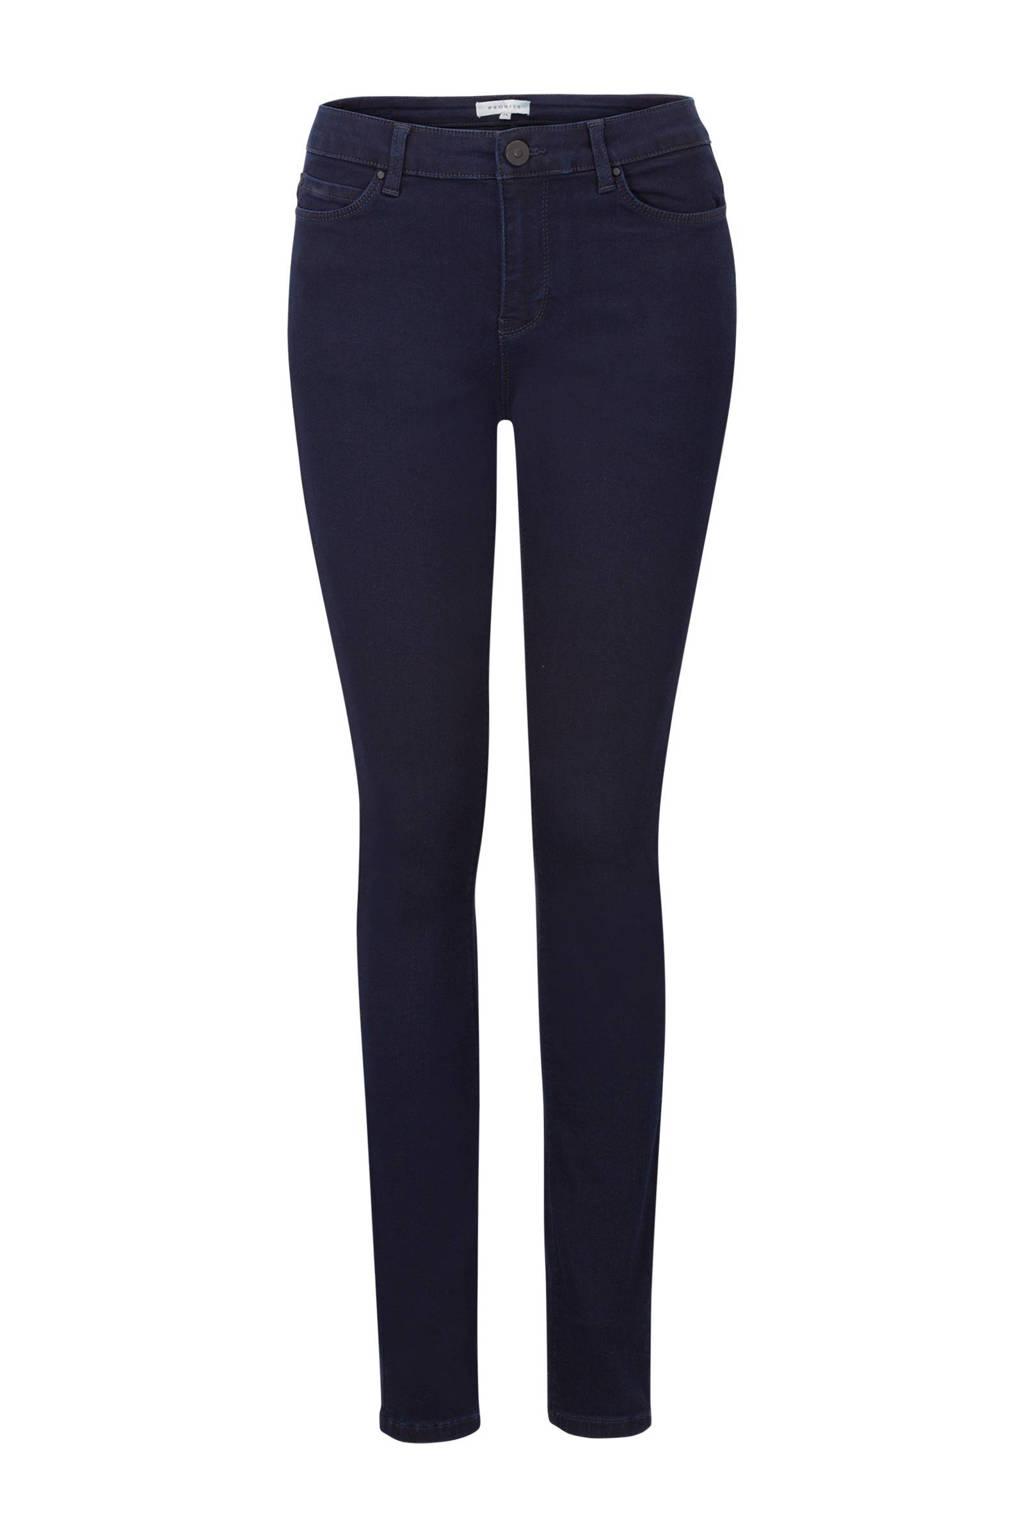 PROMISS skinny jeans donkerblauw, Donkerblauw